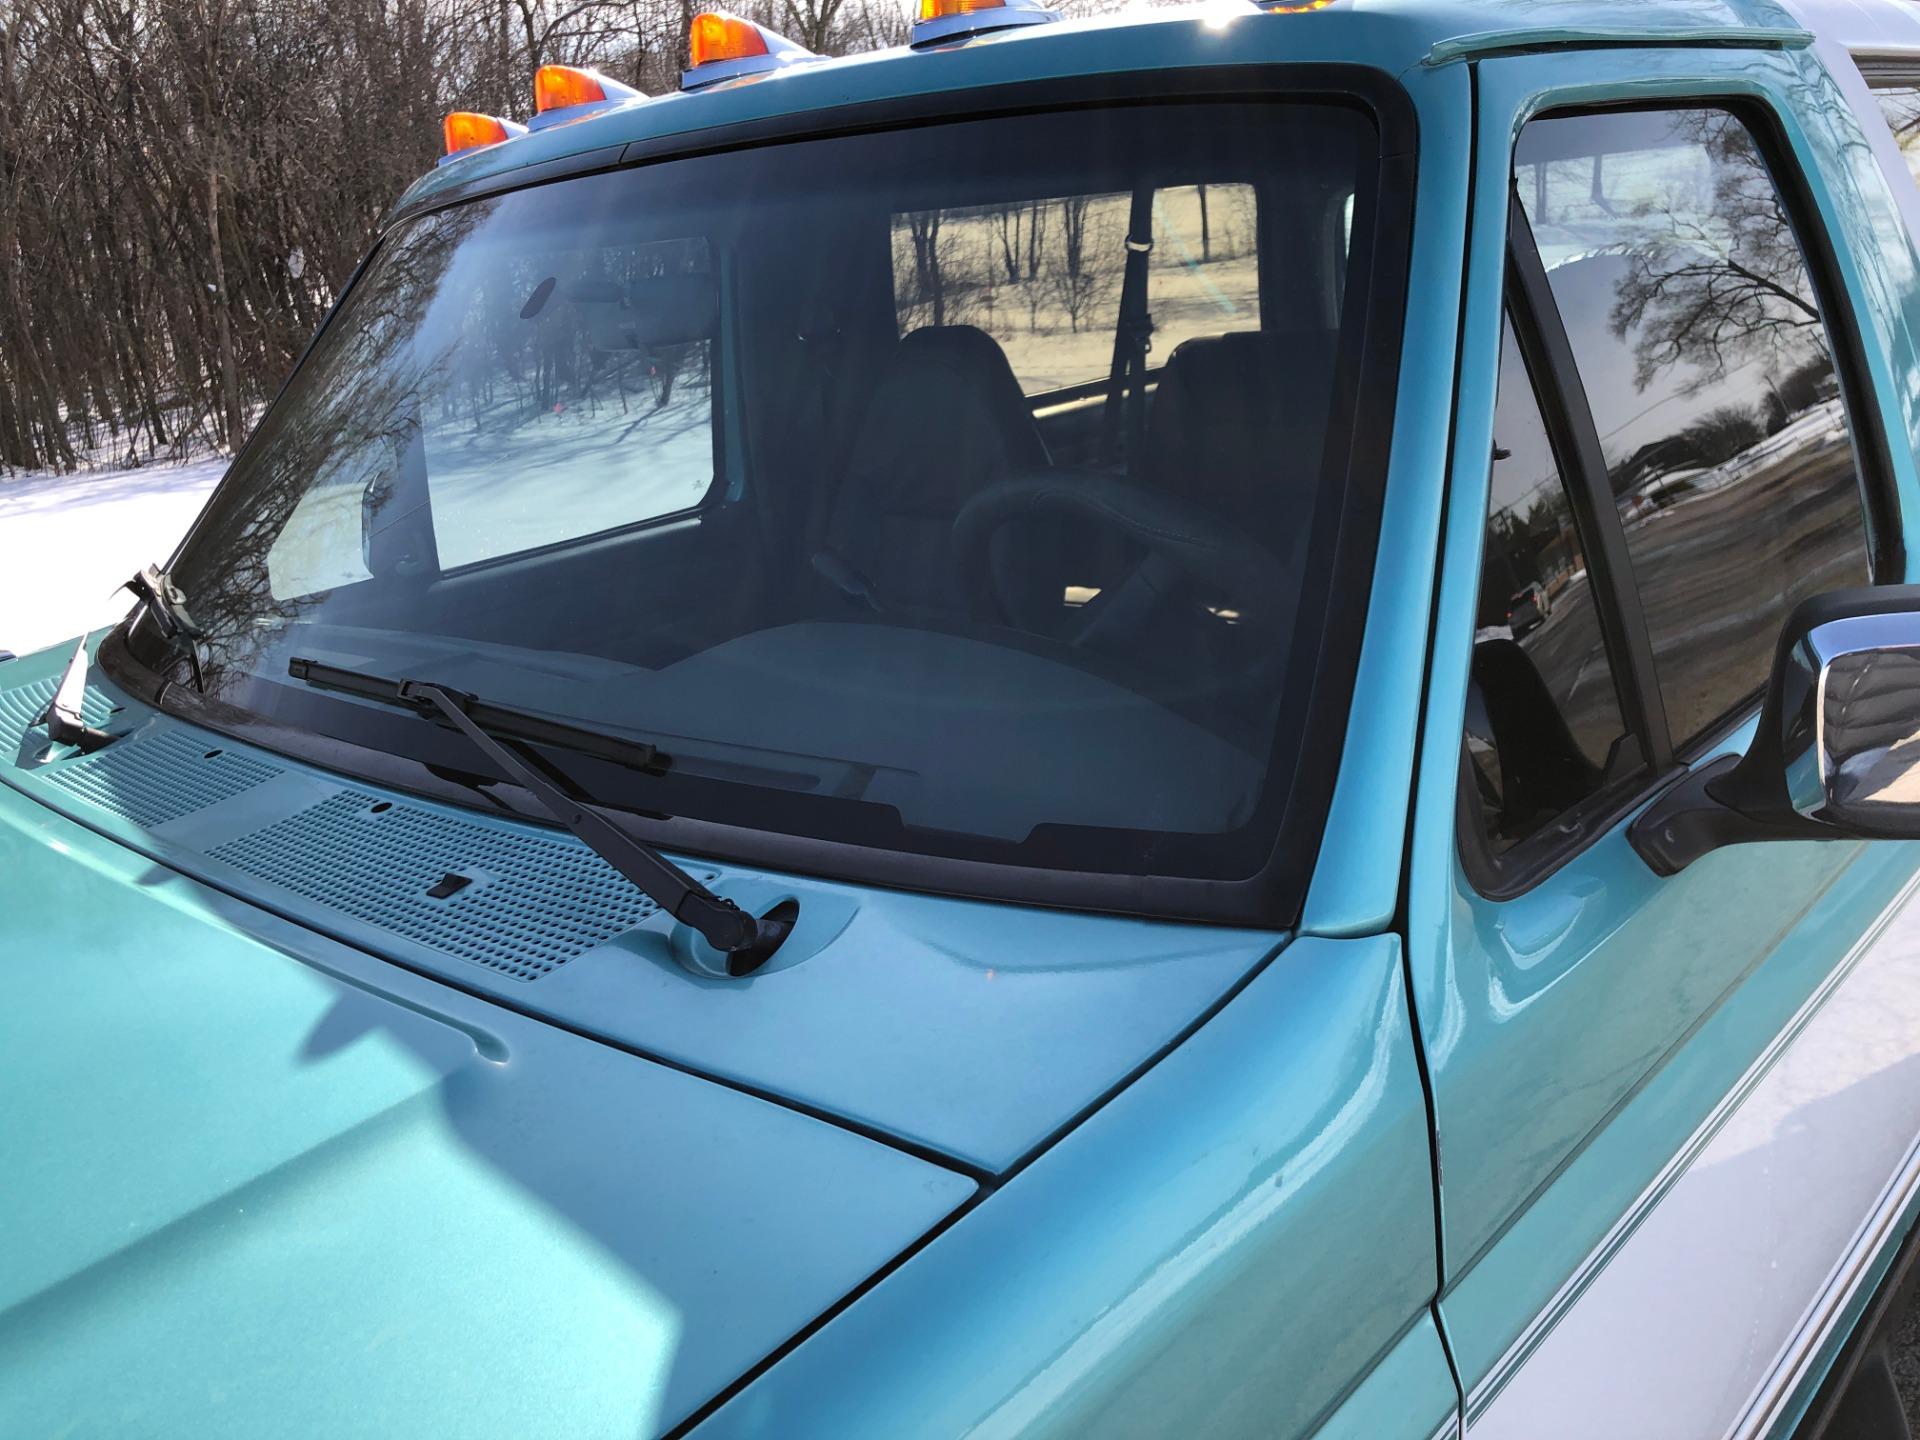 Used 1995 Ford Bronco -XLT SPORT-4x4-ARIZONA RUST FREE-ORIGINAL PAINT-VIDEO | Mundelein, IL